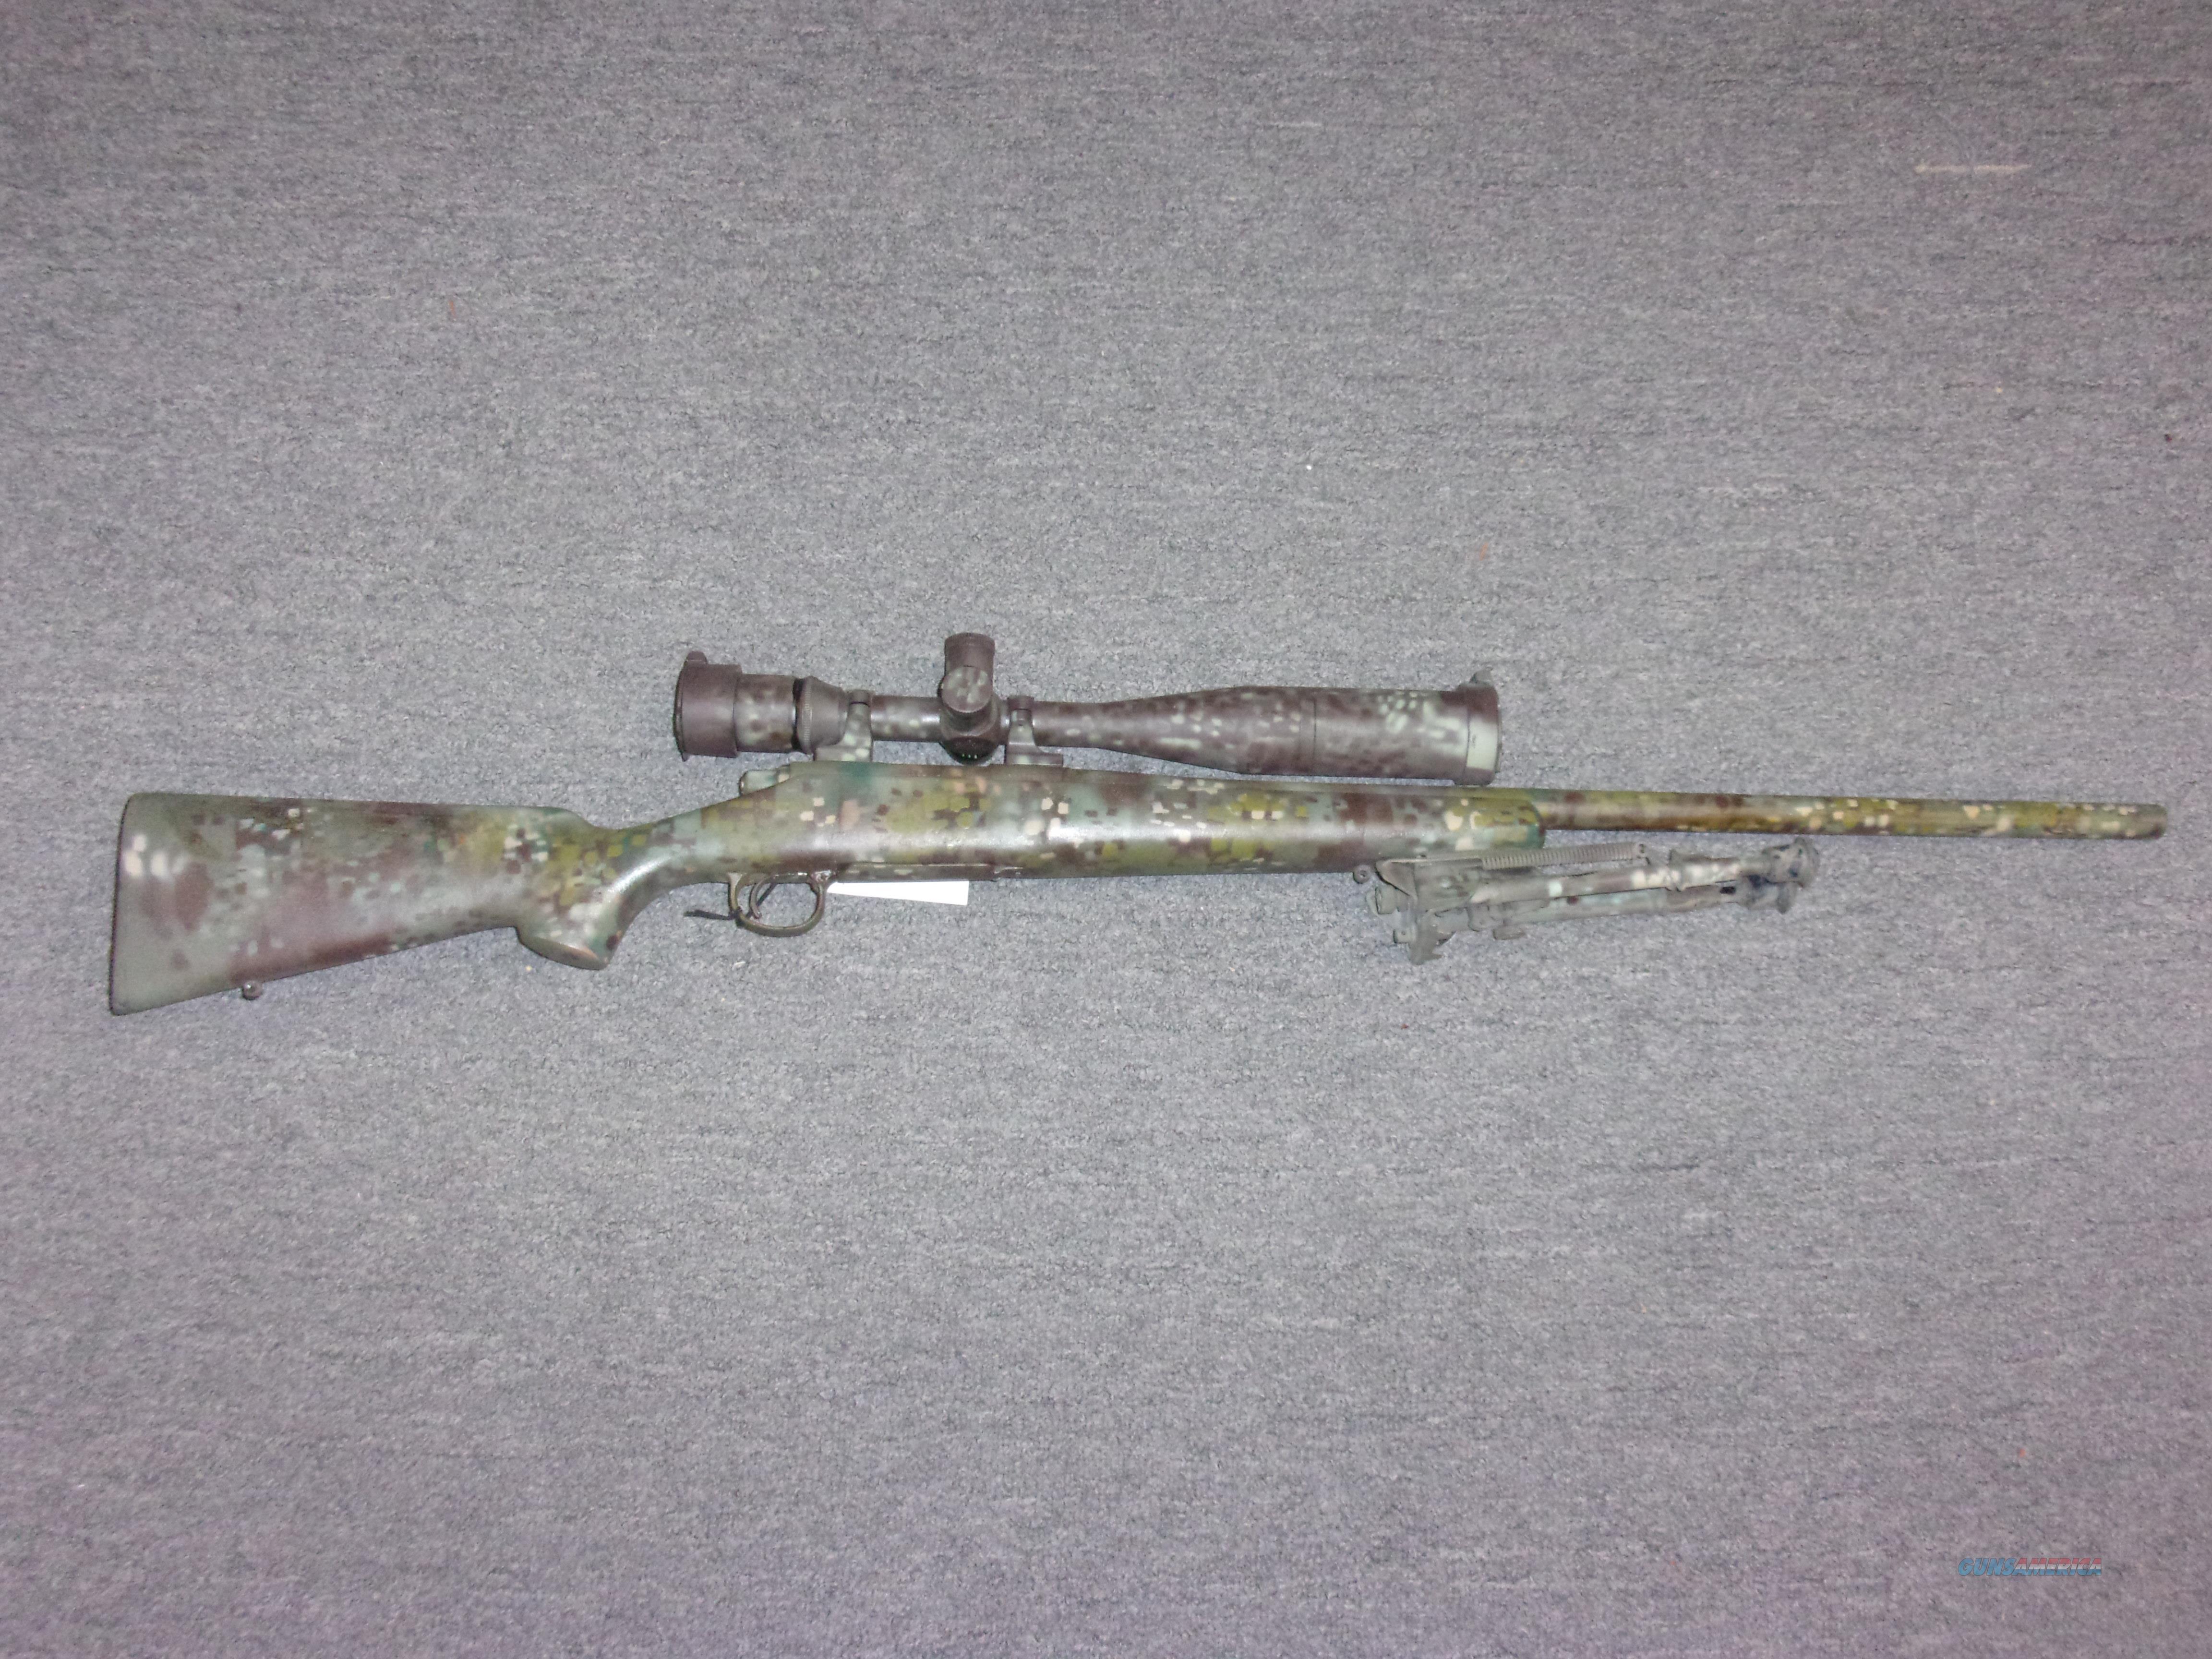 Remington 700 Left Hand .308win  Guns > Rifles > Remington Rifles - Modern > Model 700 > Tactical